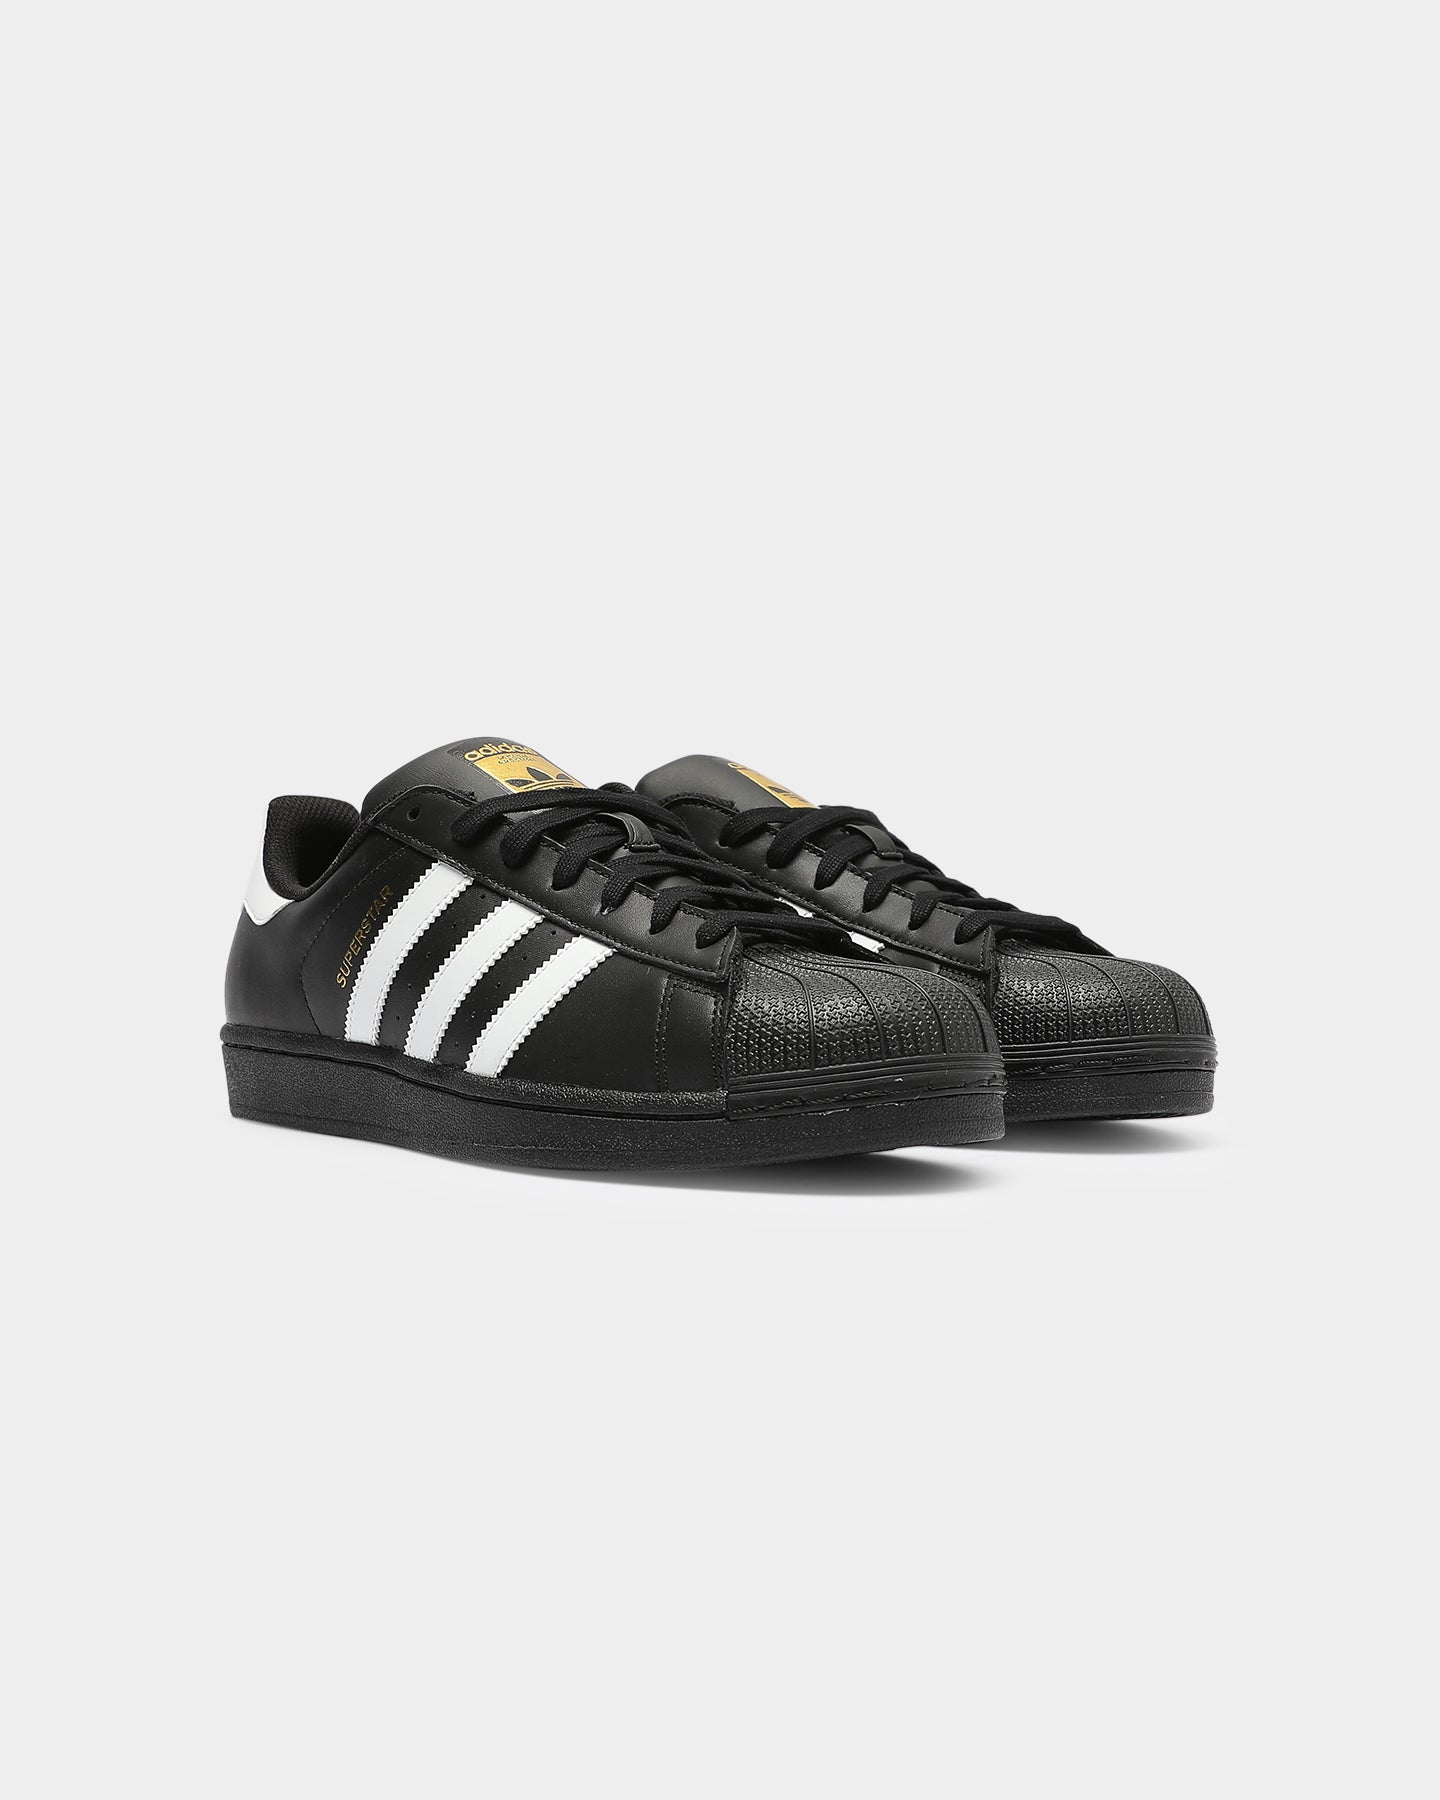 Adidas Superstar Foundation BlackWhiteBlack